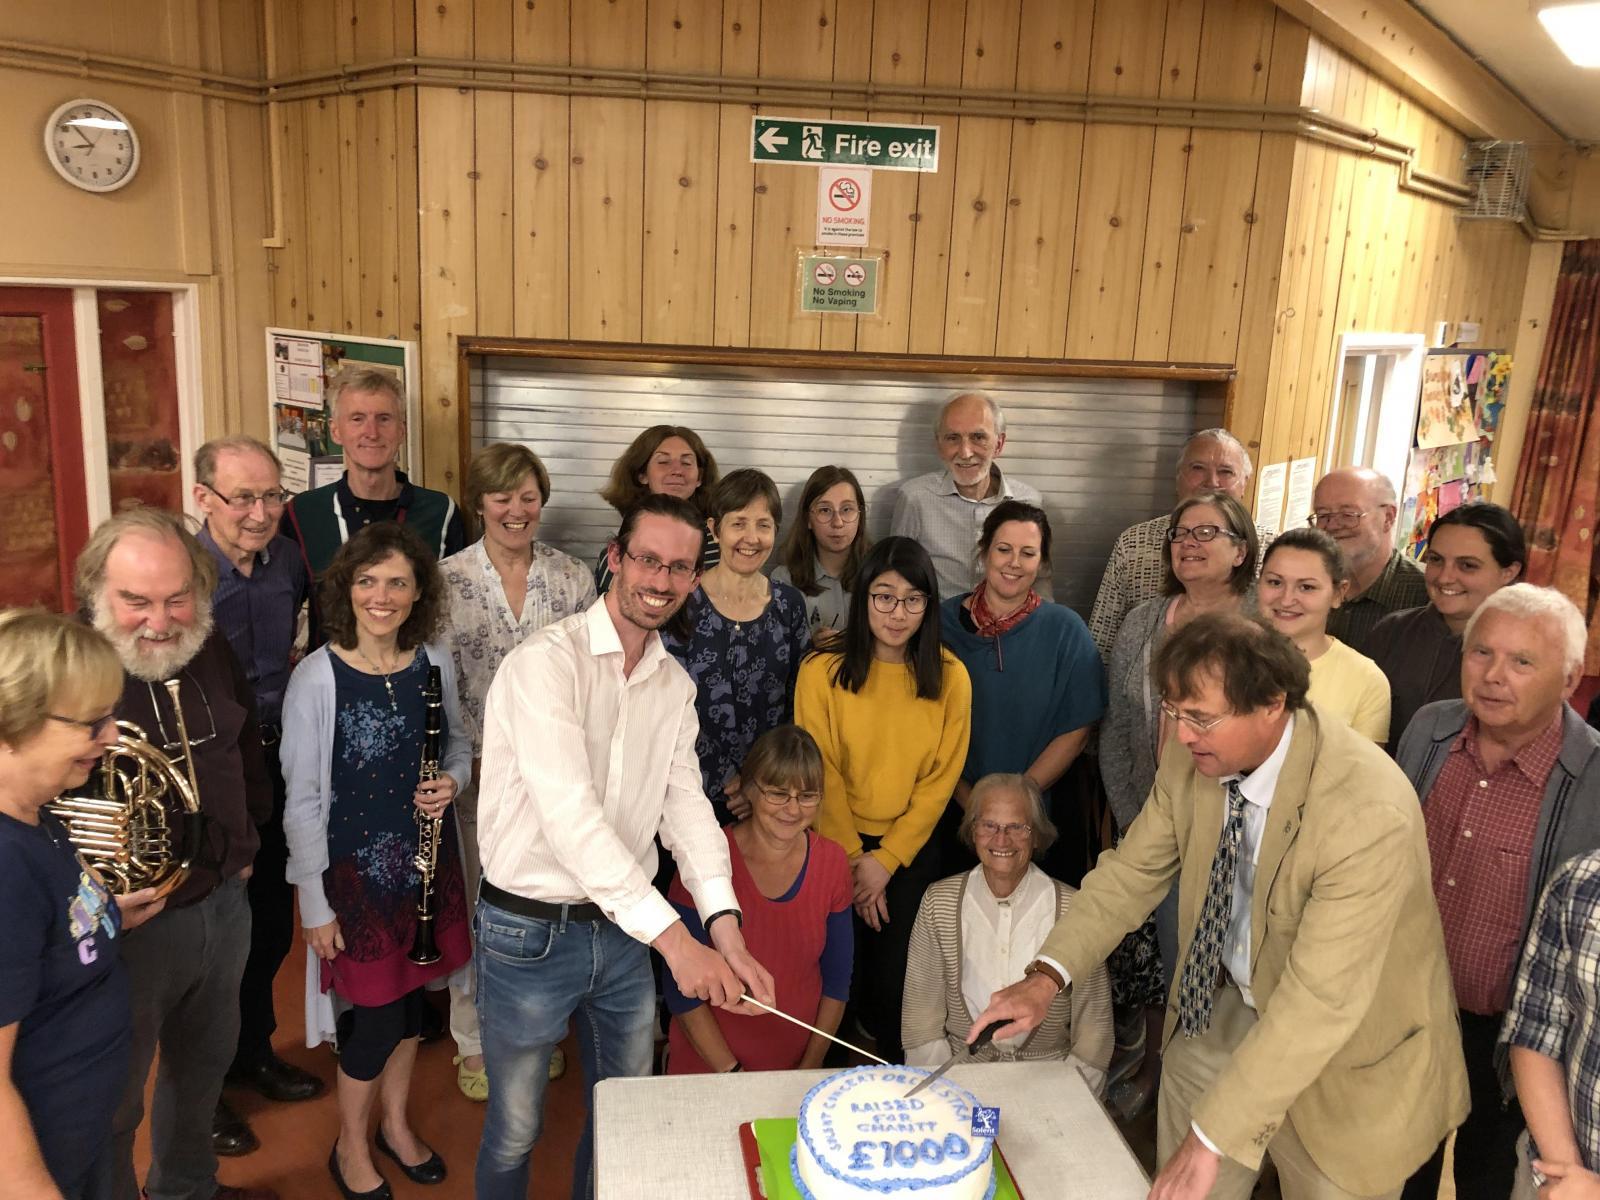 M.D. Simon Wilkins and Chairman Tim Leighton cut the celebratory cake